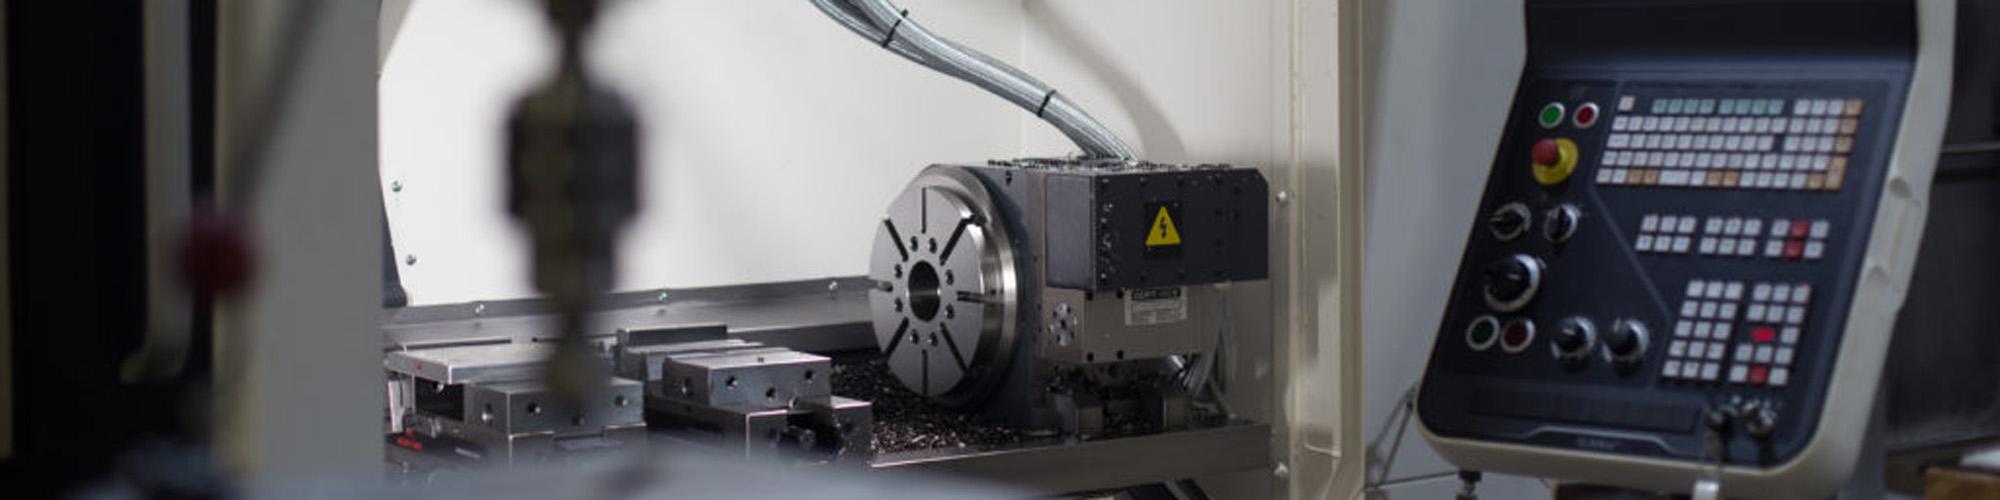 Precision CNC Machining Services   Custom CNC Machined Parts